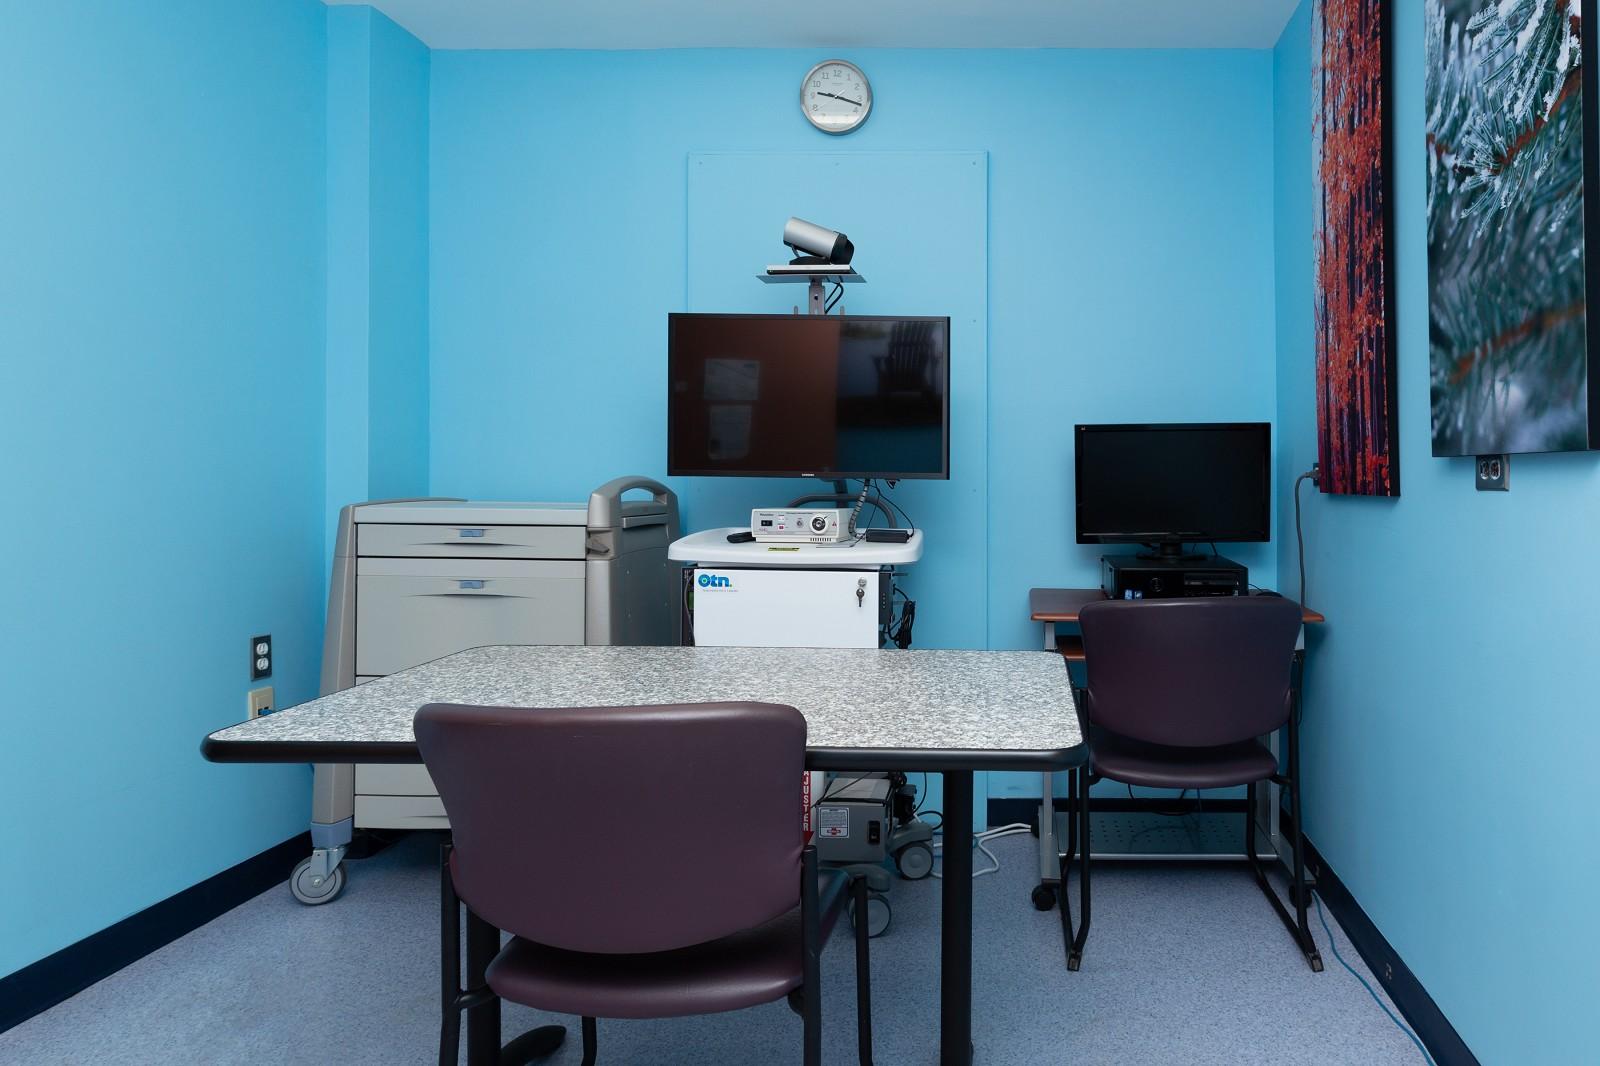 Telemedicine Room